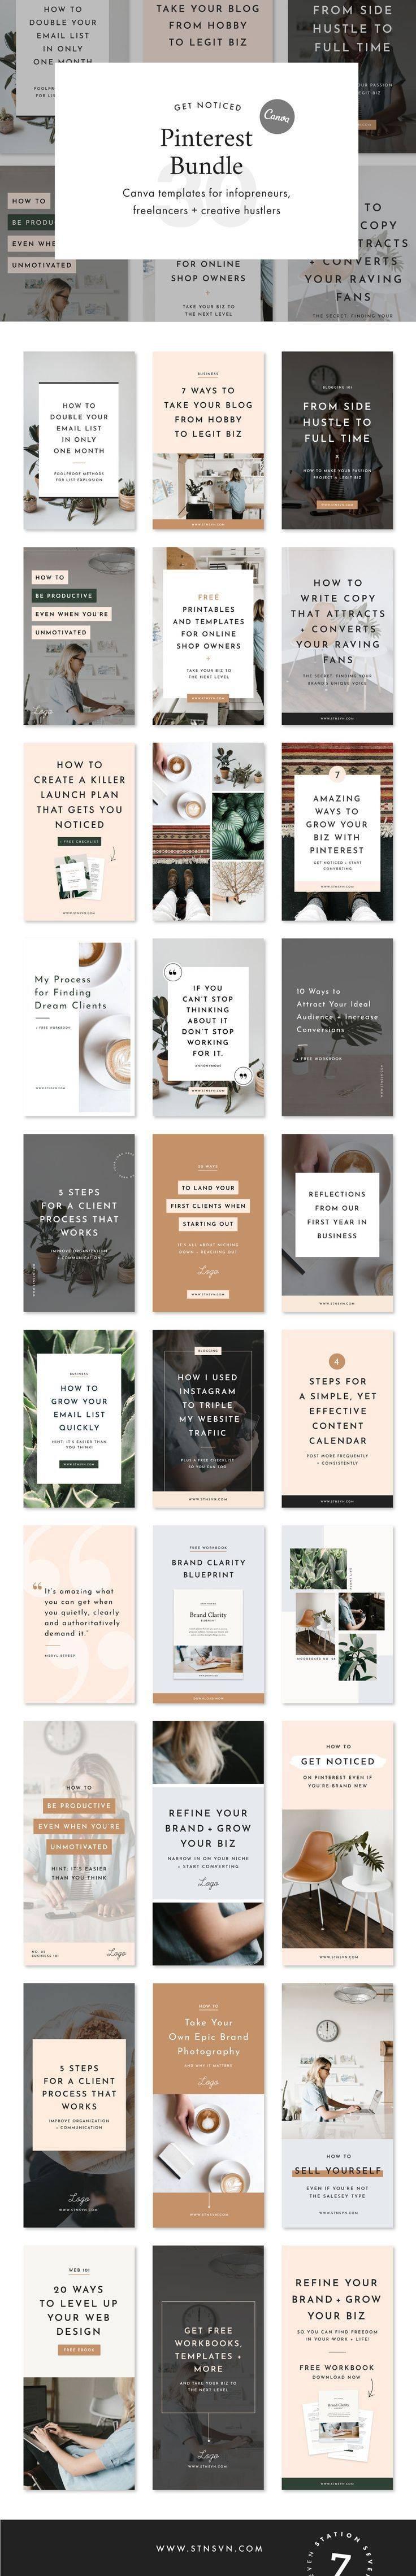 WordPress Blog Post Templates